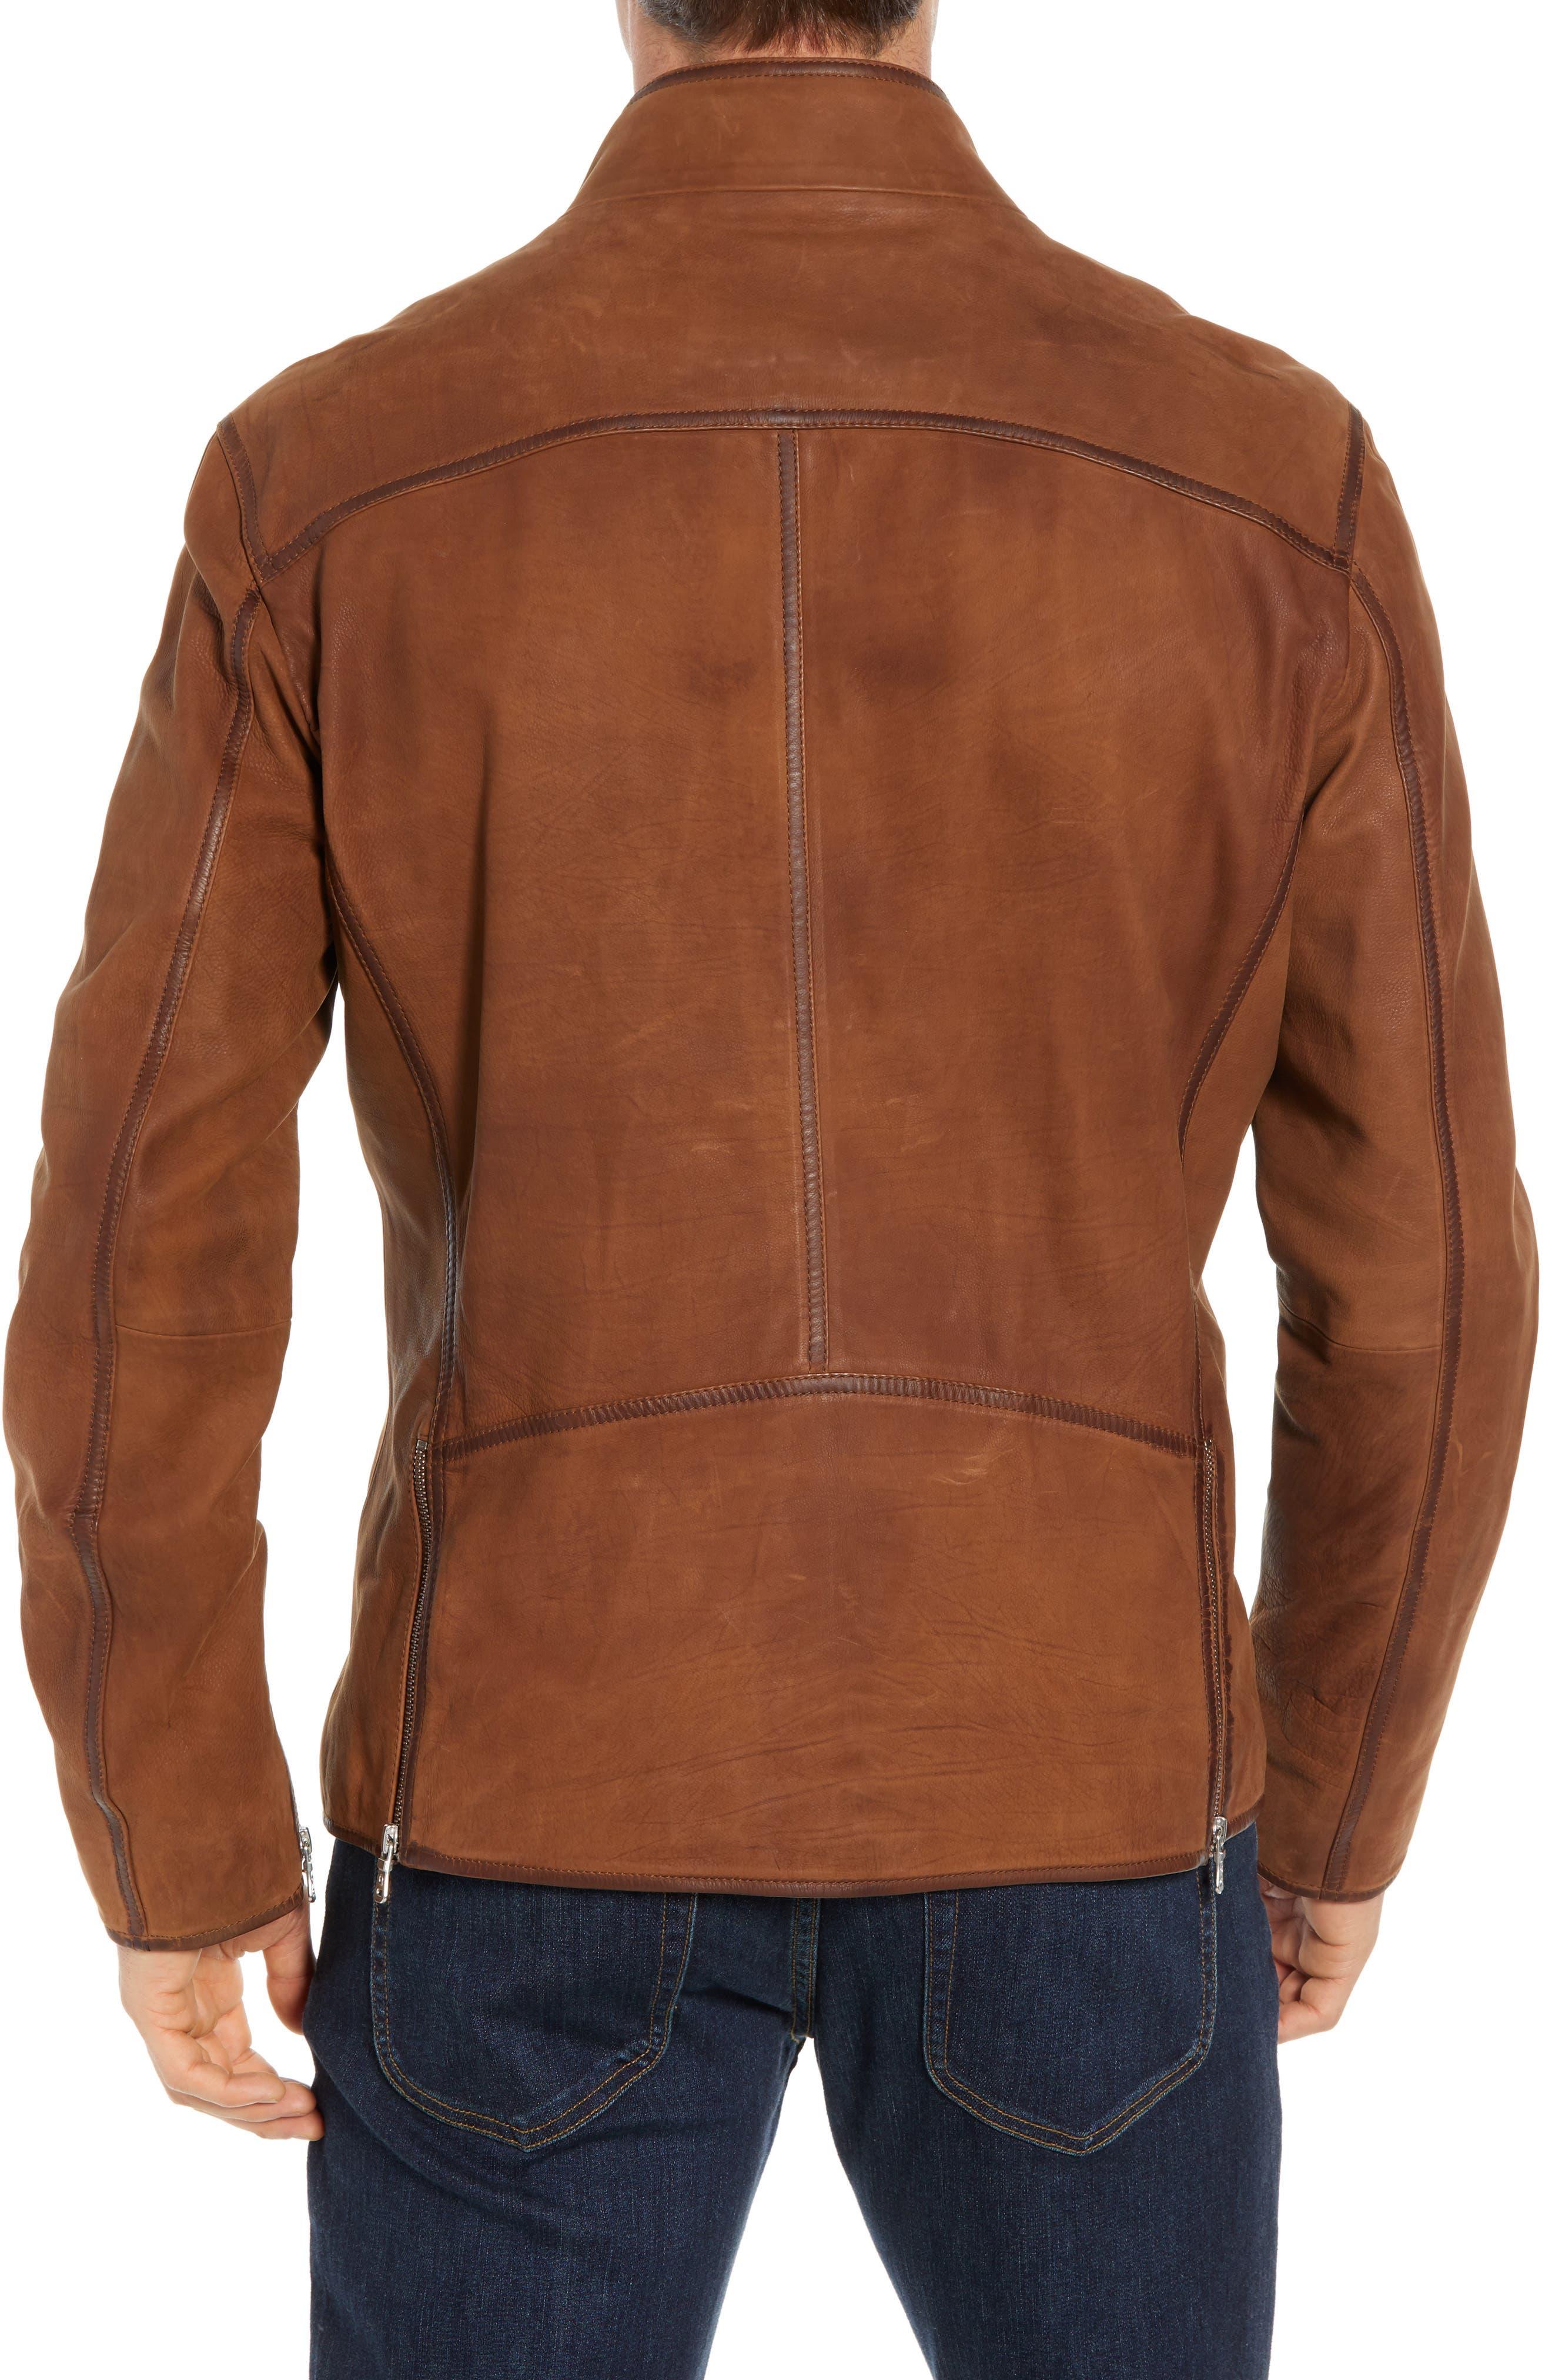 Regular Fit Leather Moto Jacket,                             Alternate thumbnail 2, color,                             COGNAC